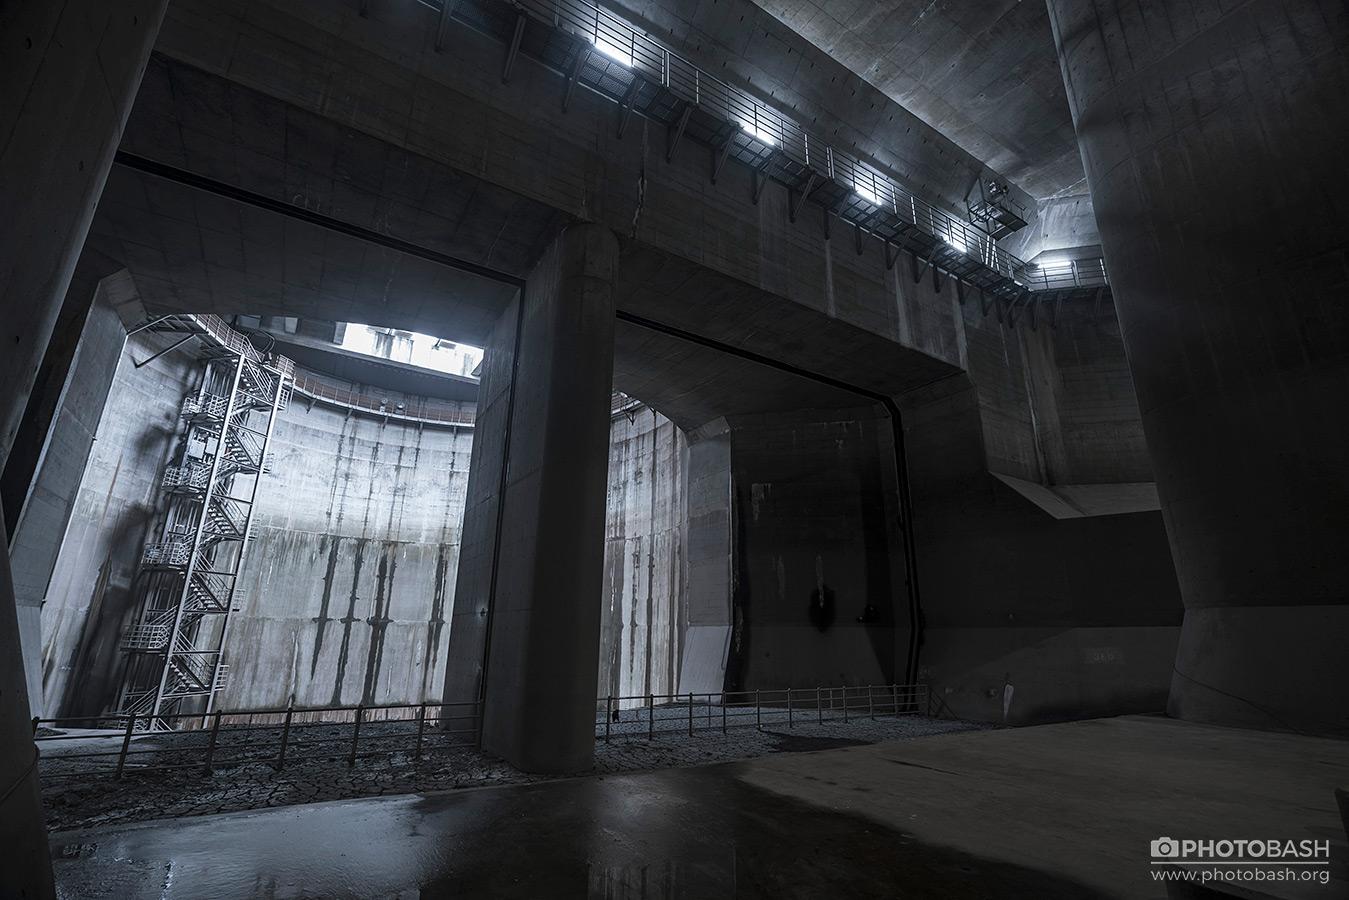 Underground-Facility-Flood-Tunnel.jpg